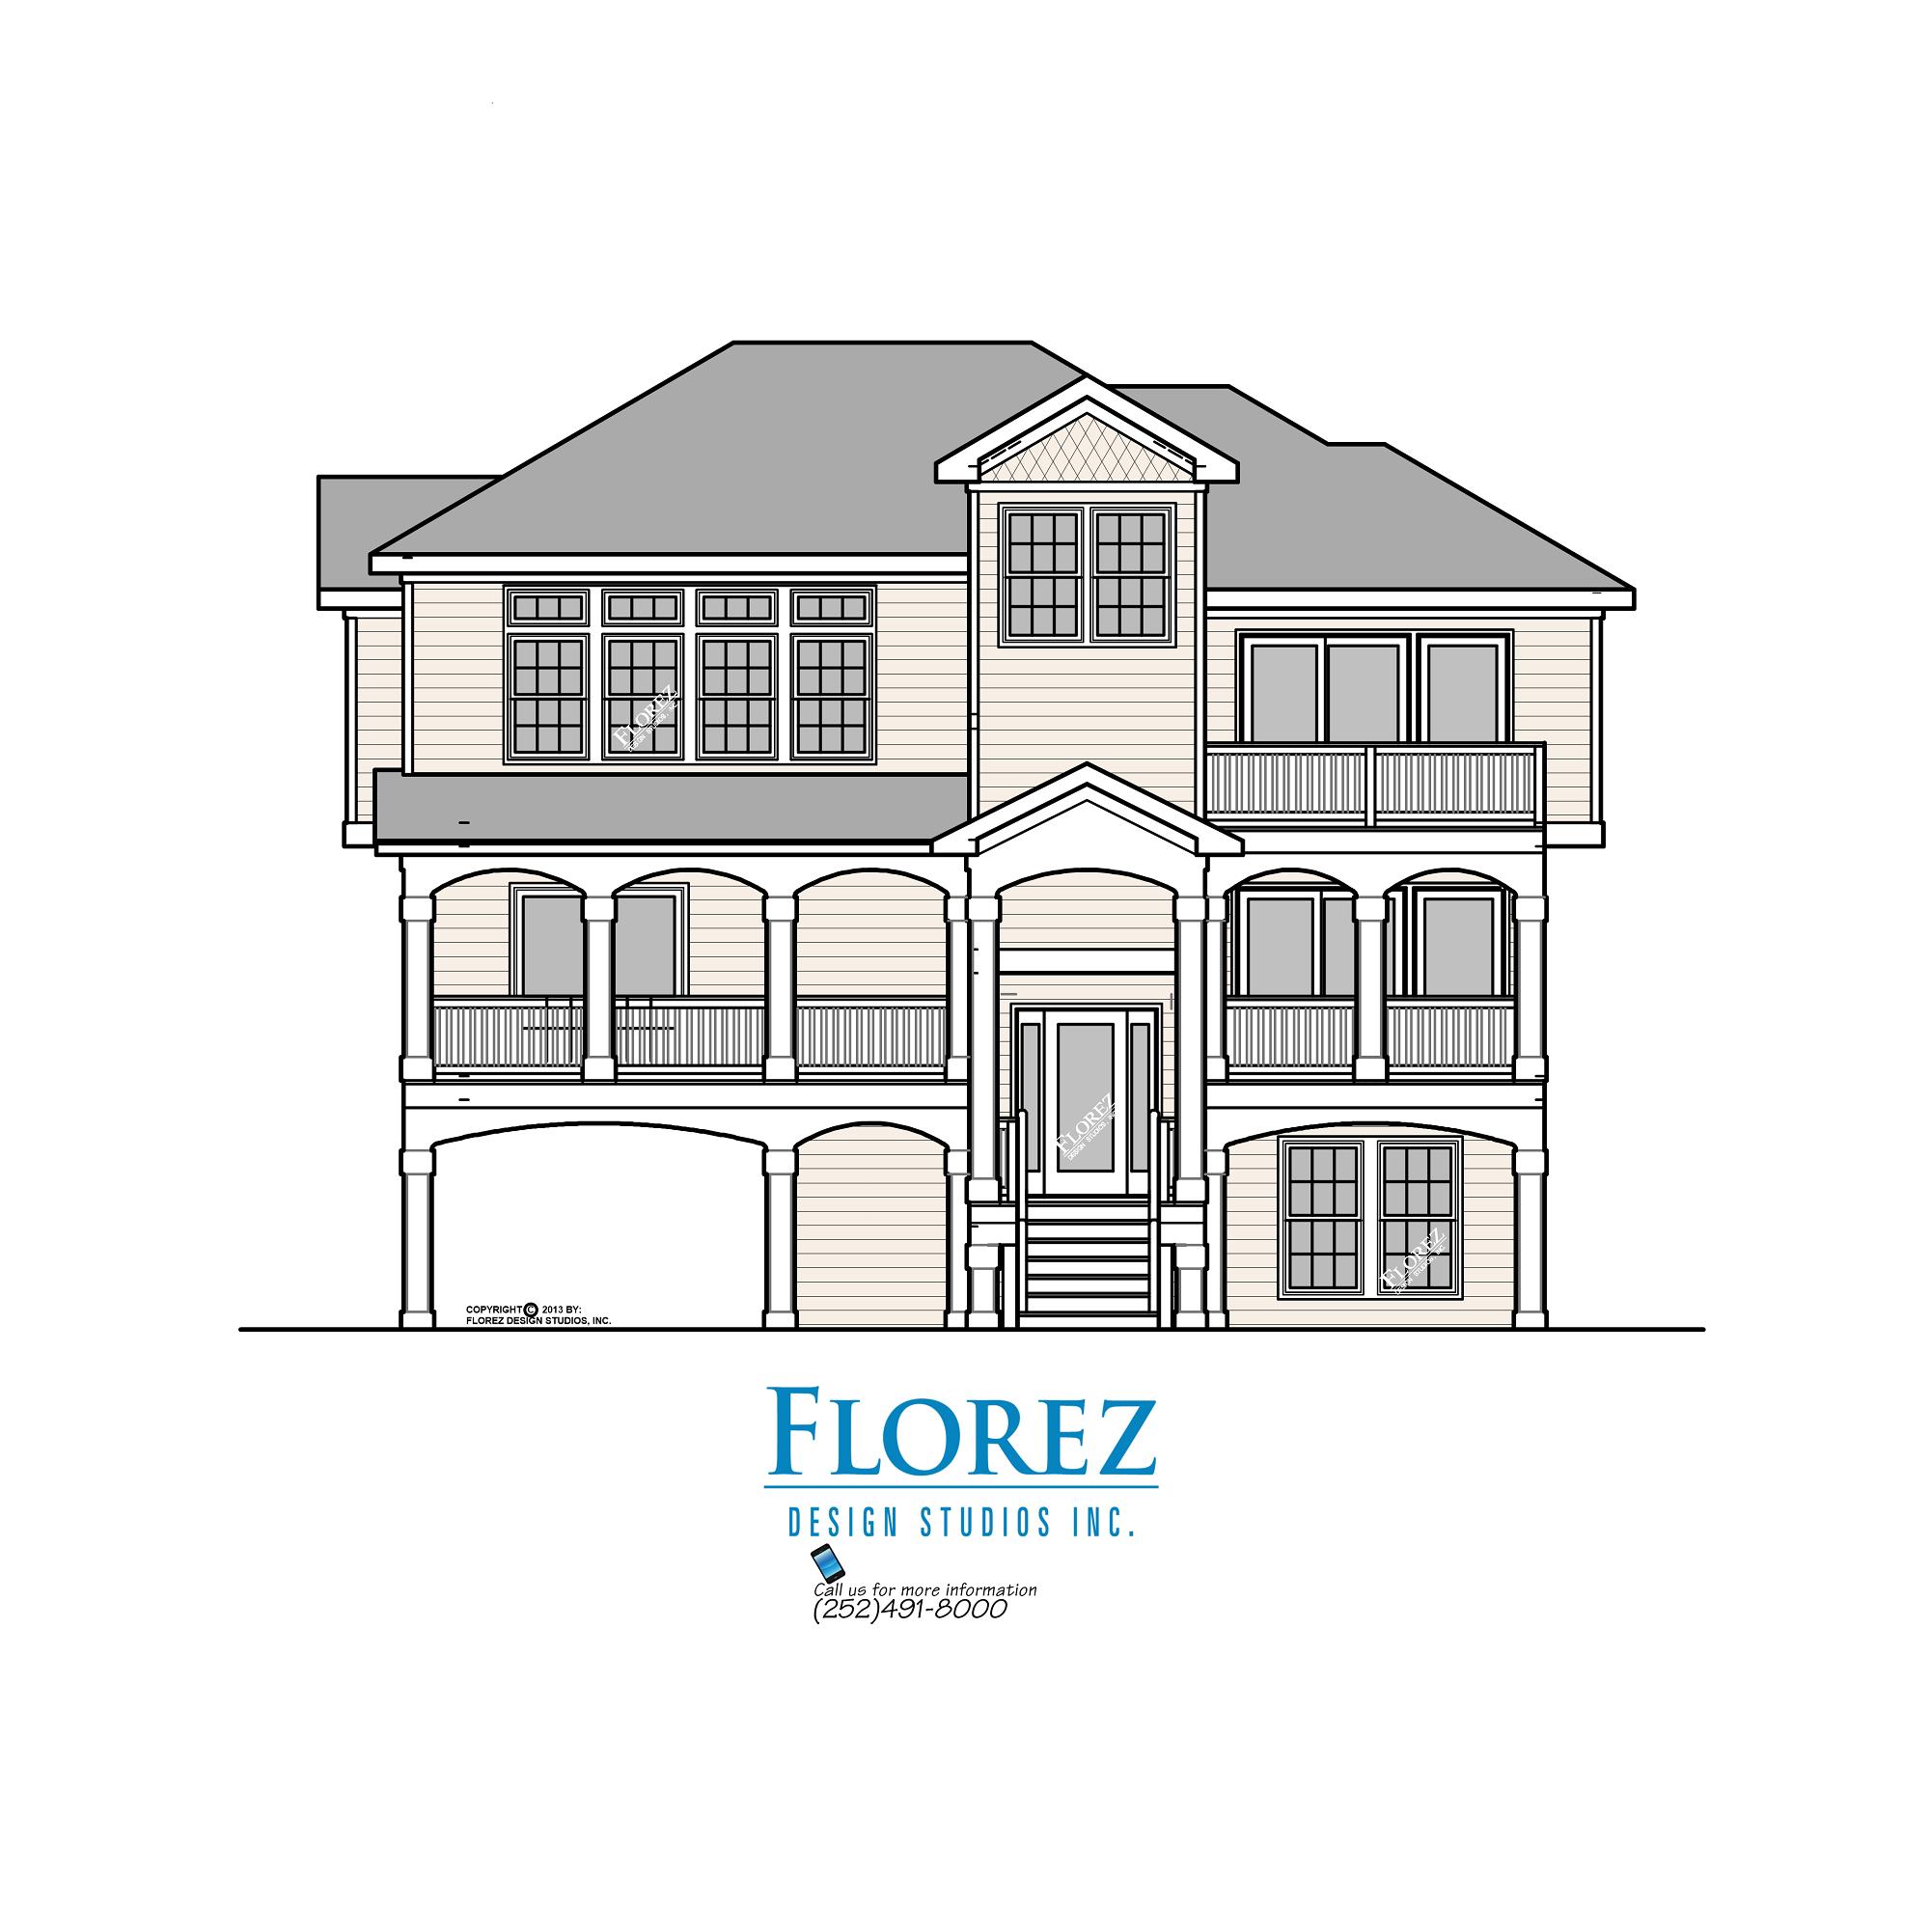 2500 Sq Ft 3000 Sq Ft Homes Florez Design Studios